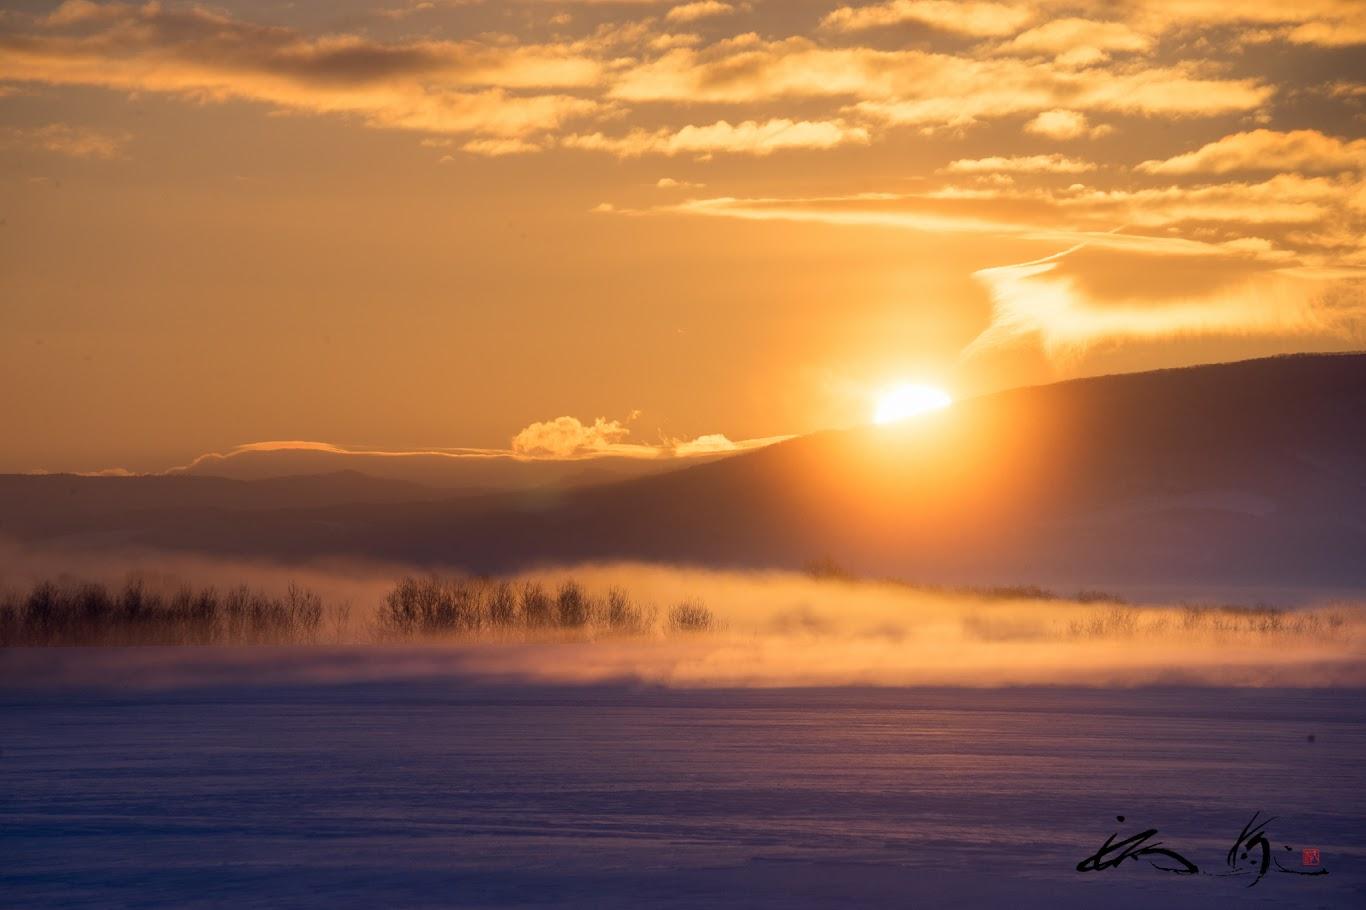 神々しい黄金の朝陽